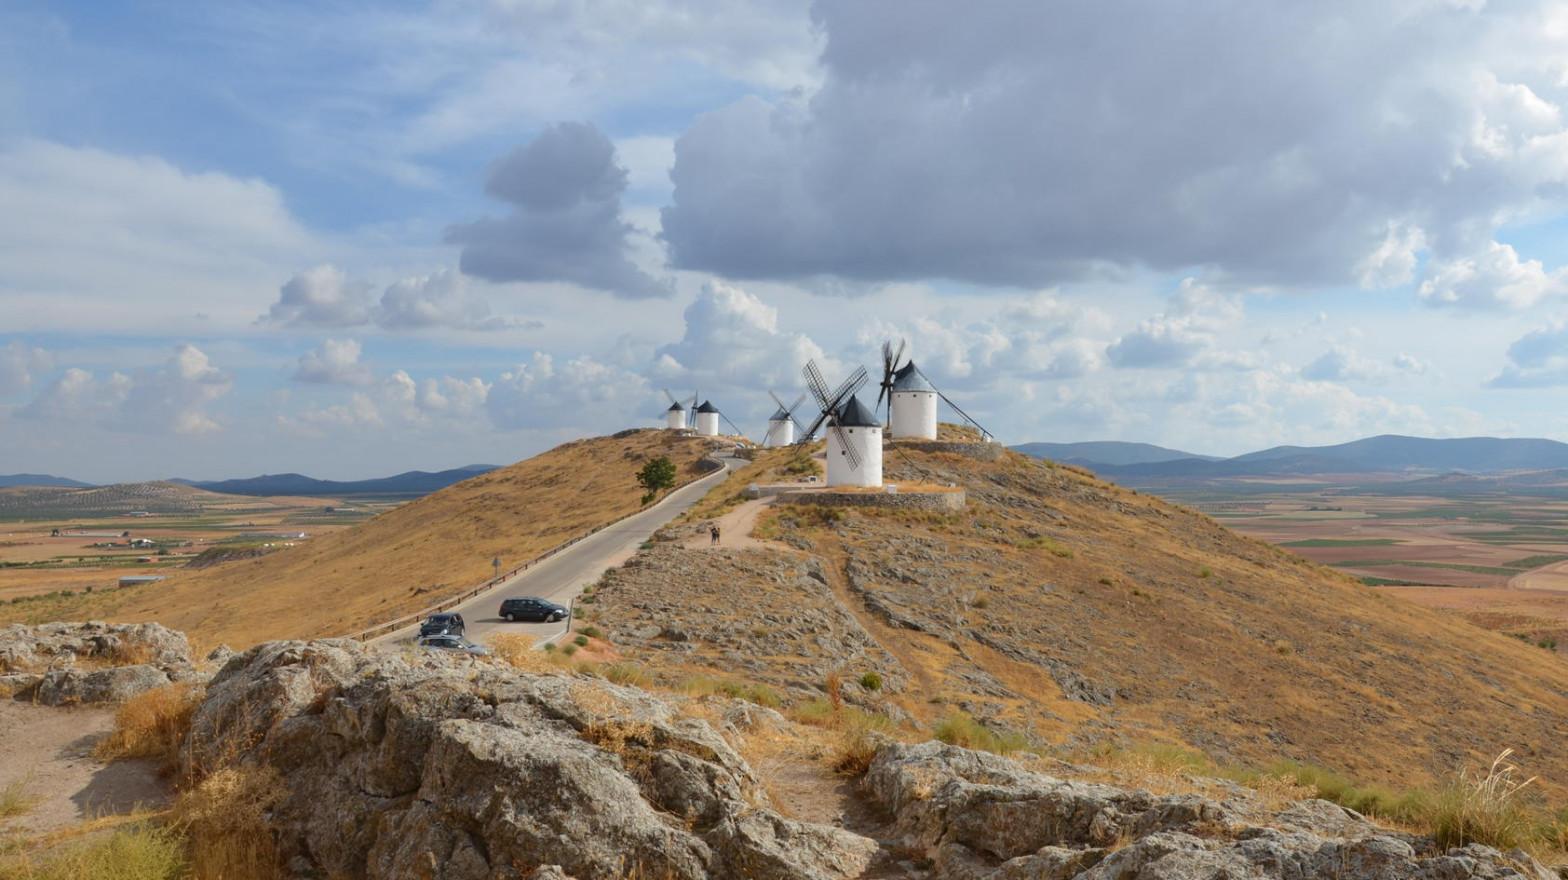 © Turismo de Consuegra